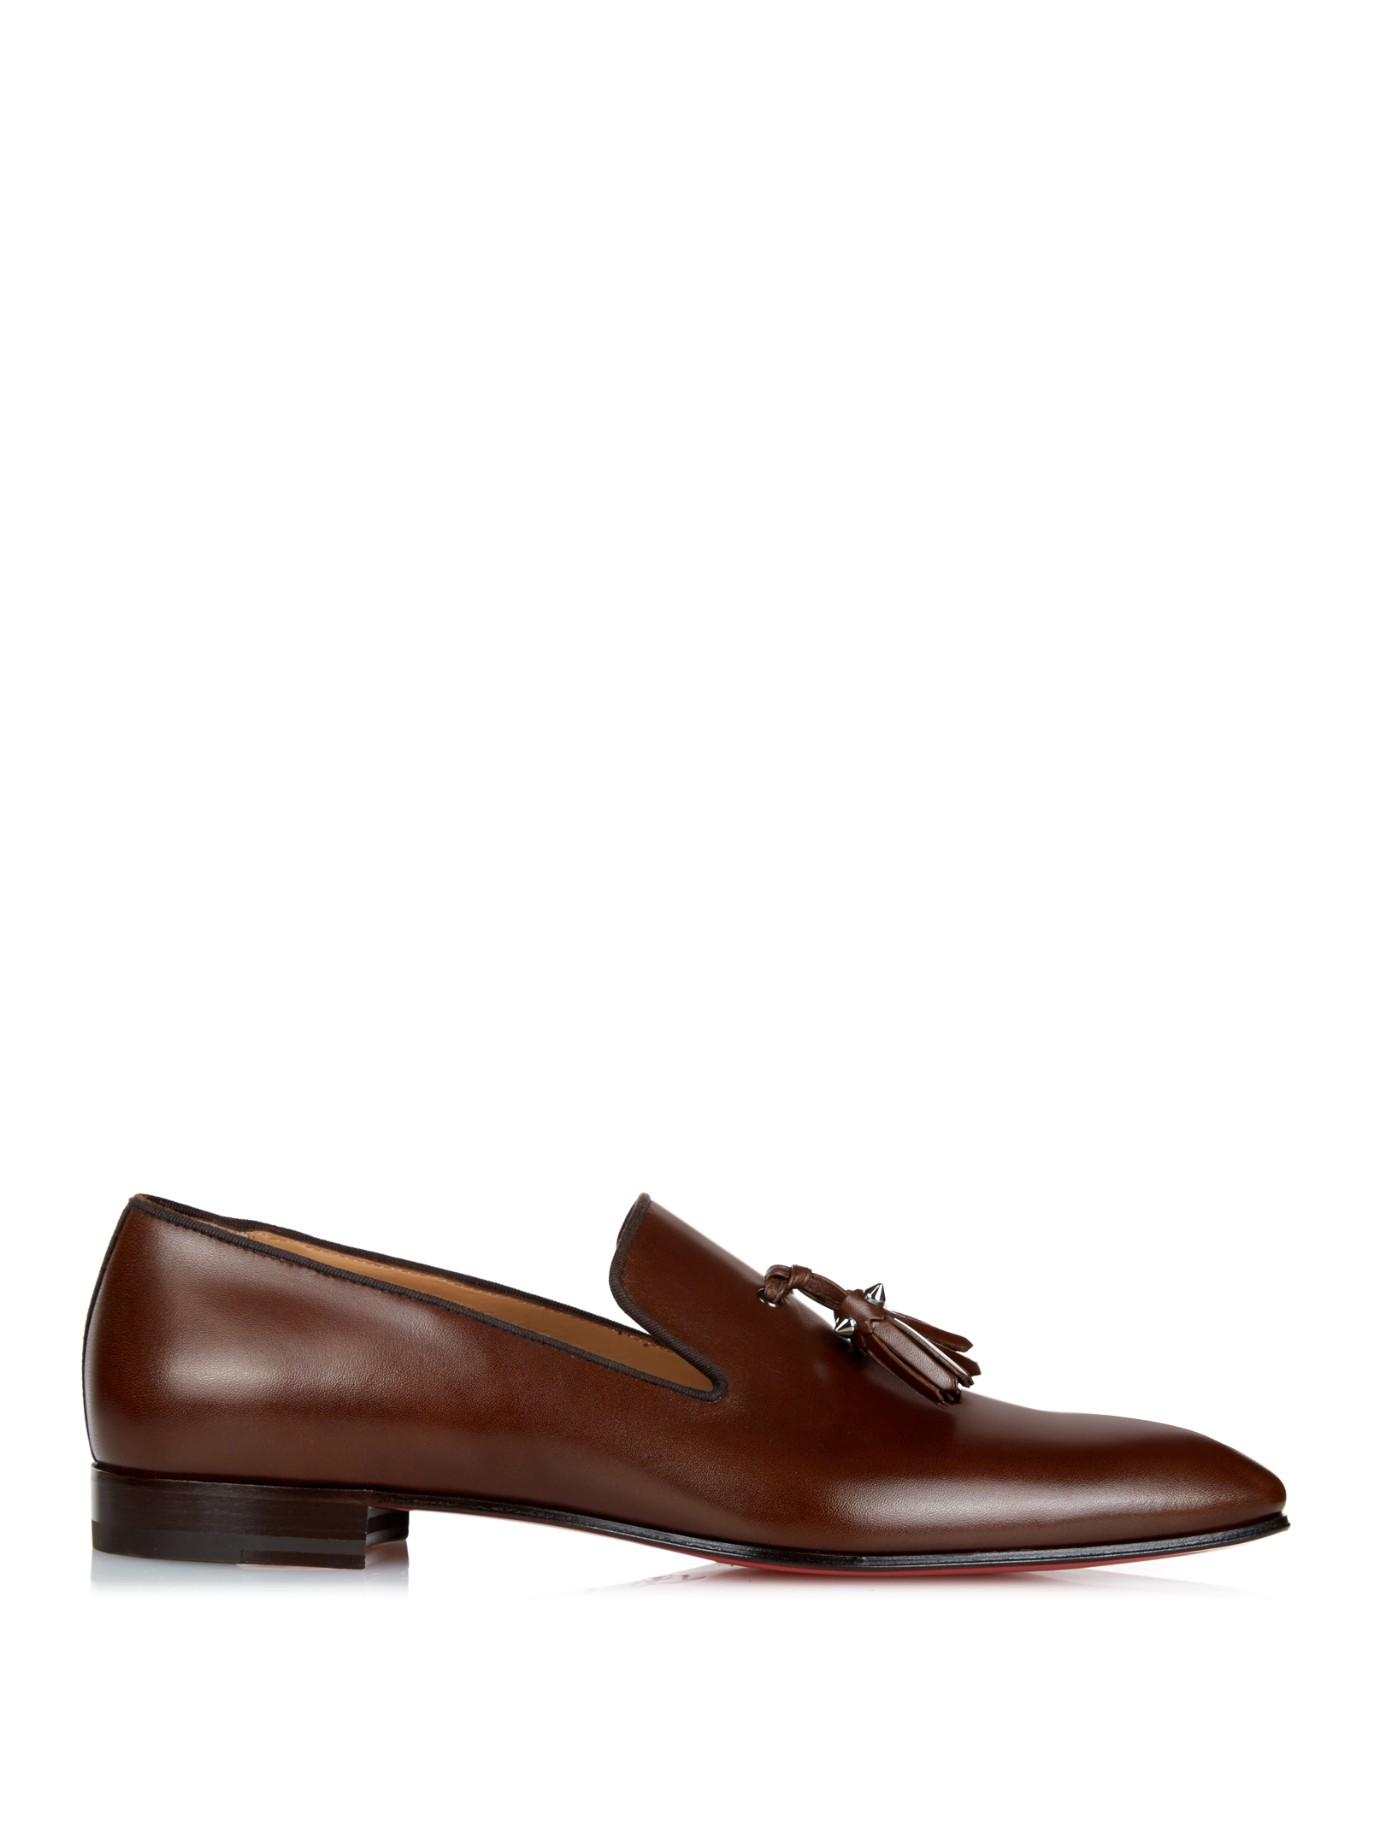 Christian Louboutin Loafers de moda